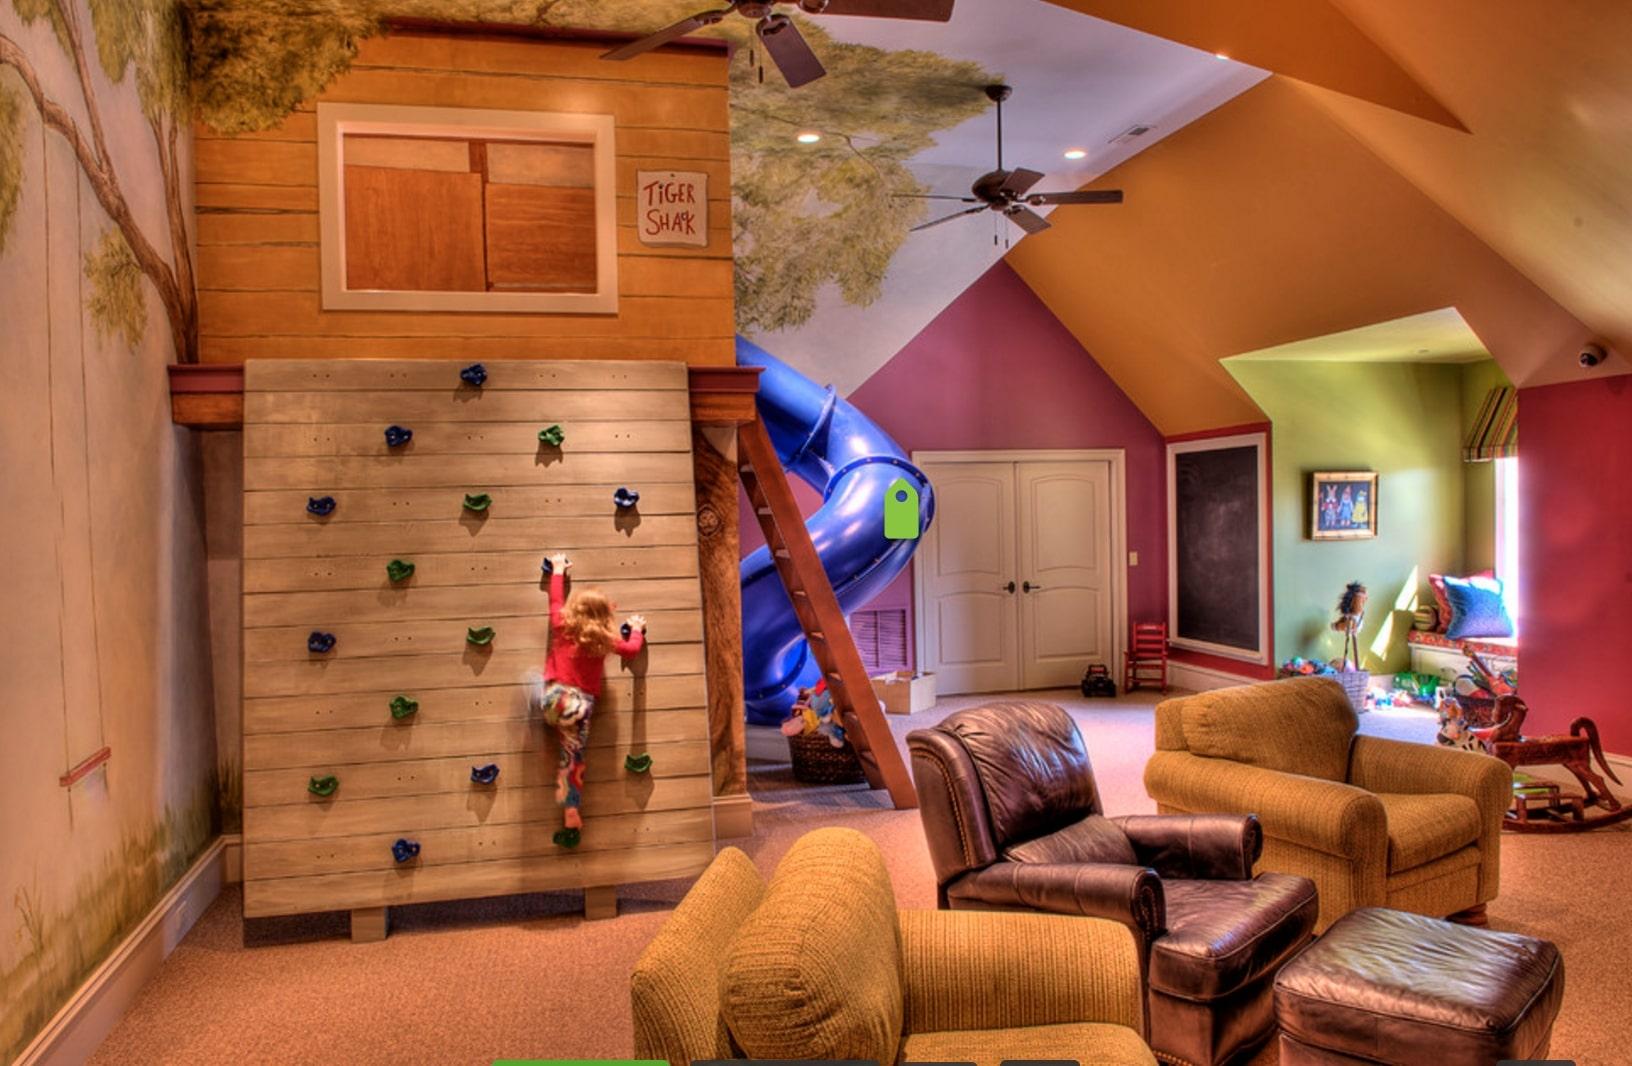 indoor playhouse for kids ideas on foter rh foter com